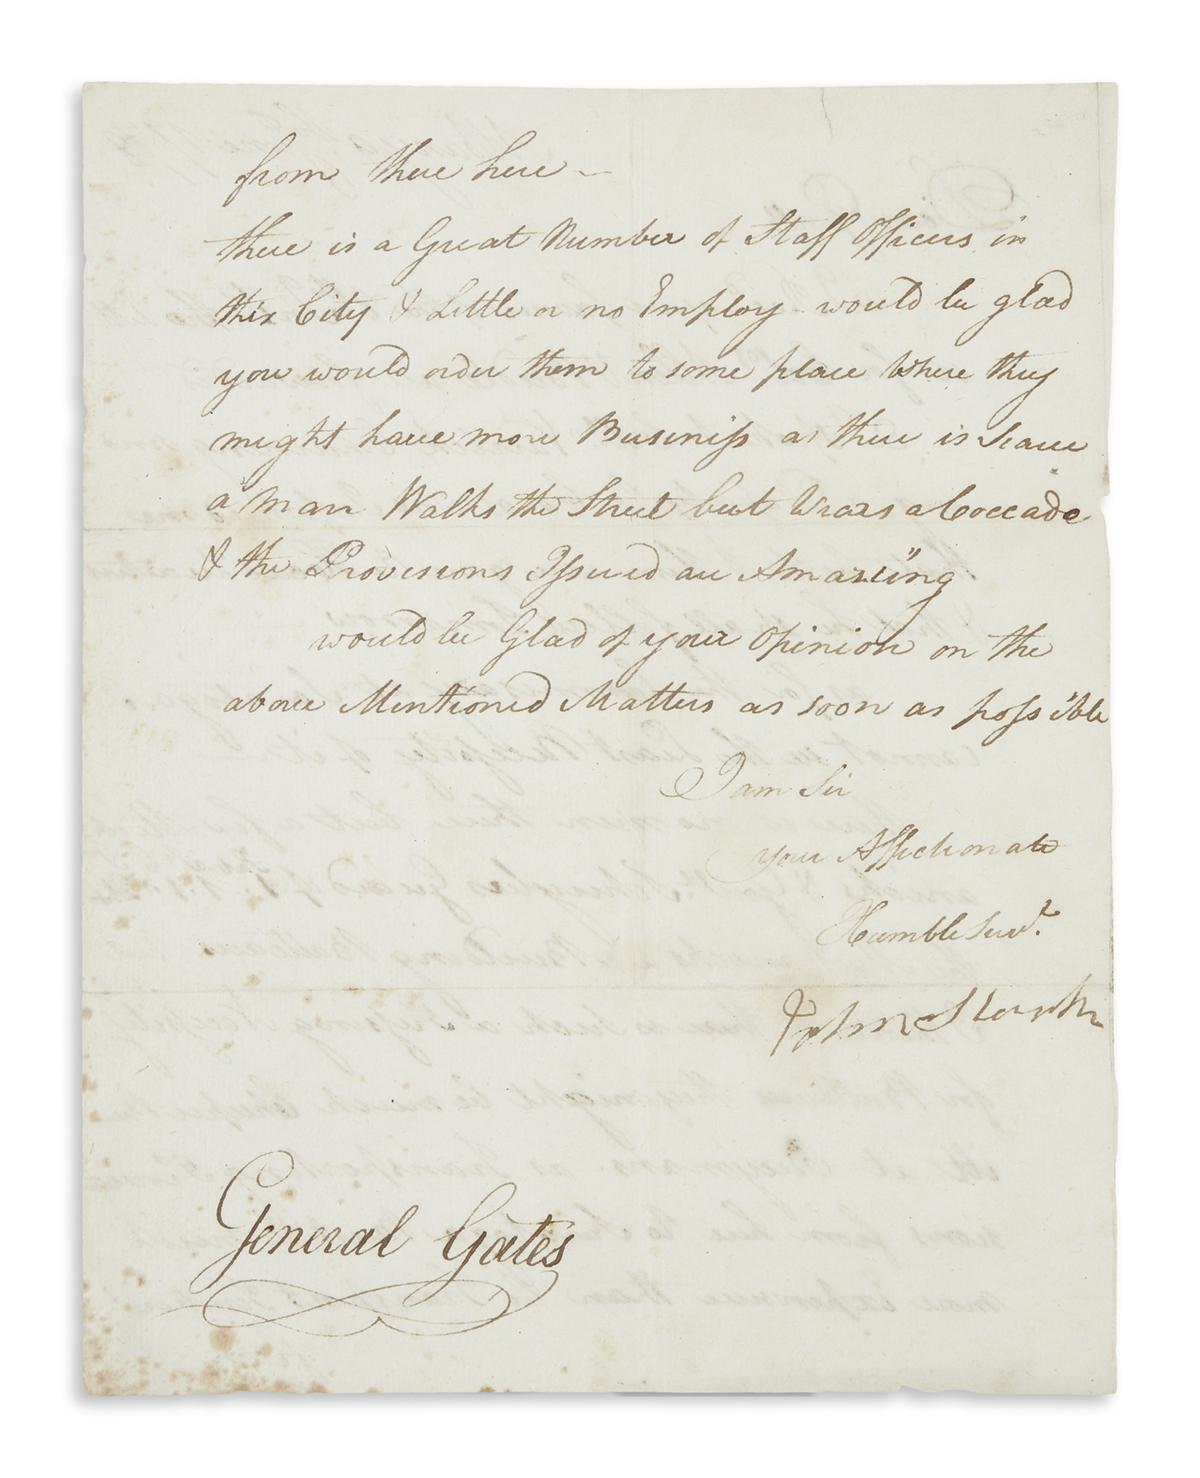 STARK, JOHN. Letter Signed, as Brigadier General, to Major General Horatio Gates,